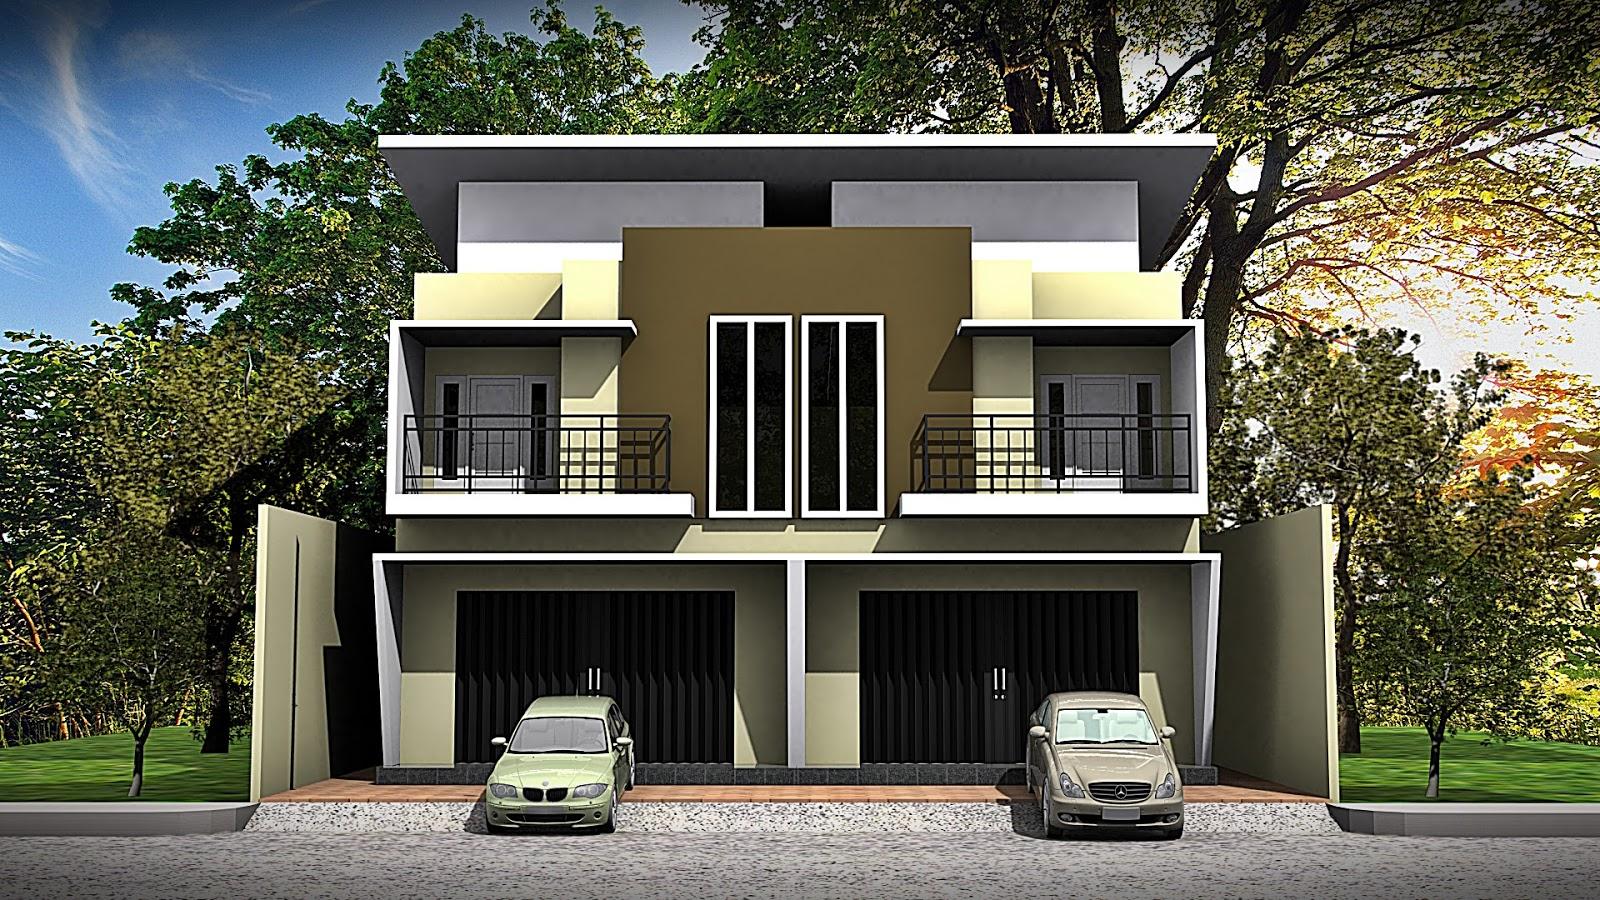 Agratek Studio Arsitektur - Sipil Engineering: Desain Ruko Minimalis